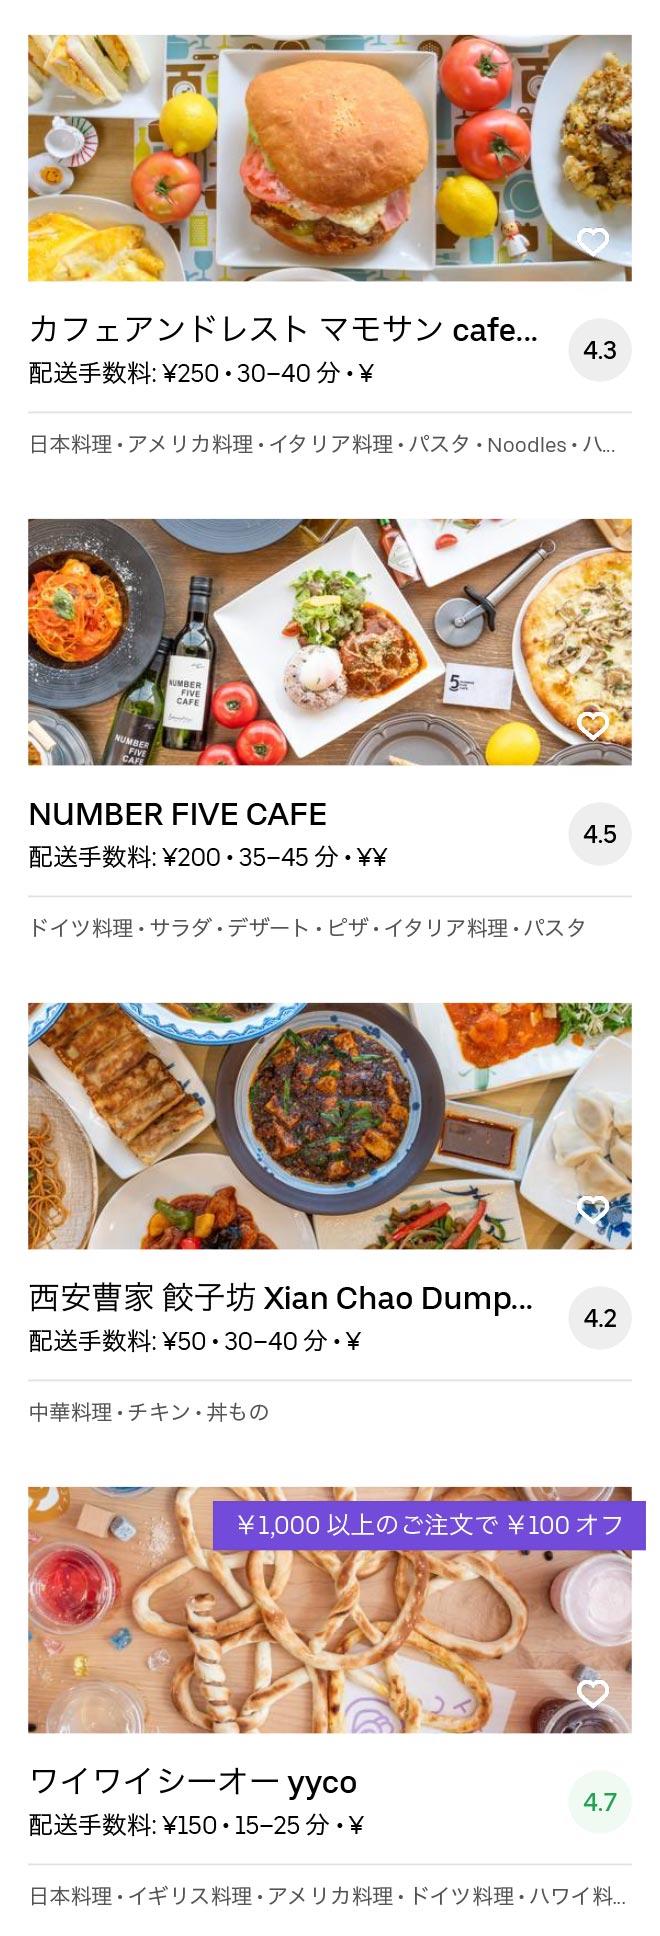 Amagasaki menu 2005 10